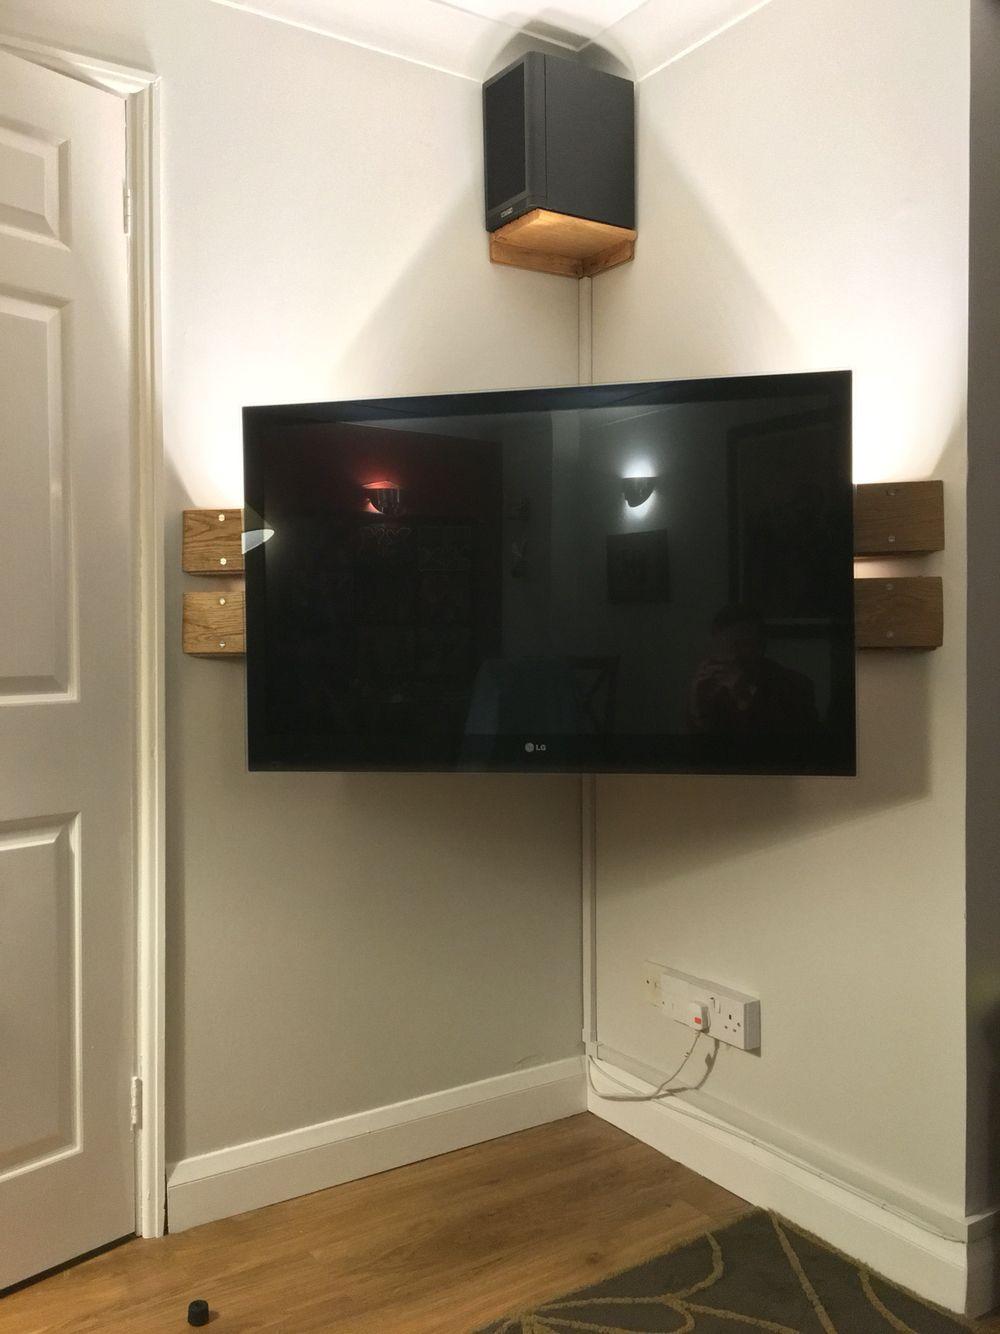 Chic And Modern Tv Wall Mount Ideas For Living Room Tv Stenka Modern Nastennyj Televizor Televizionnaya Stena